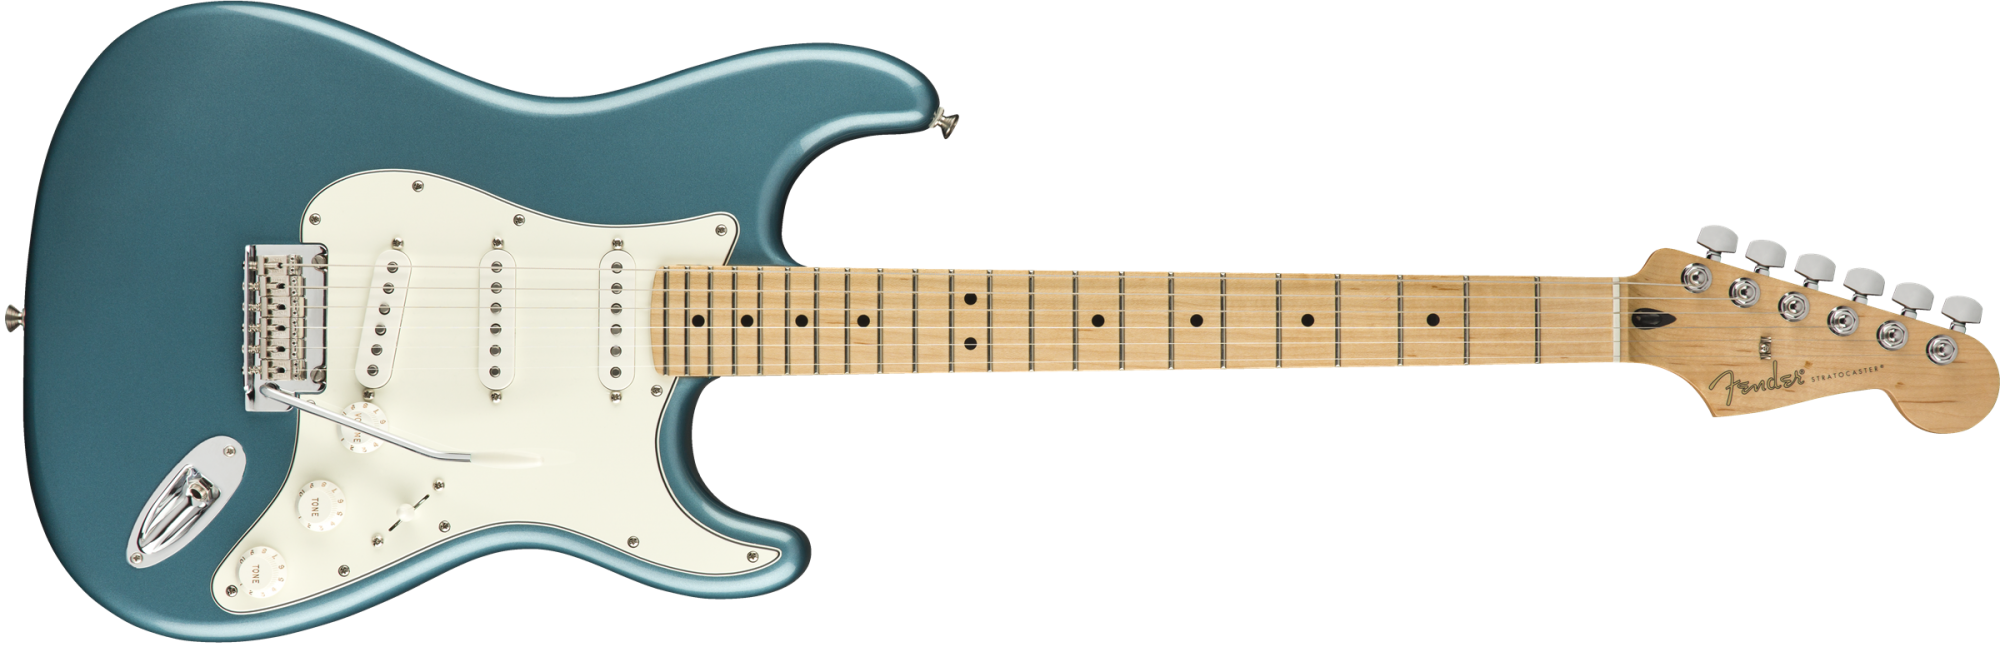 Fender Player Series Stratocaster - Maple Fingerboard - Tidepool